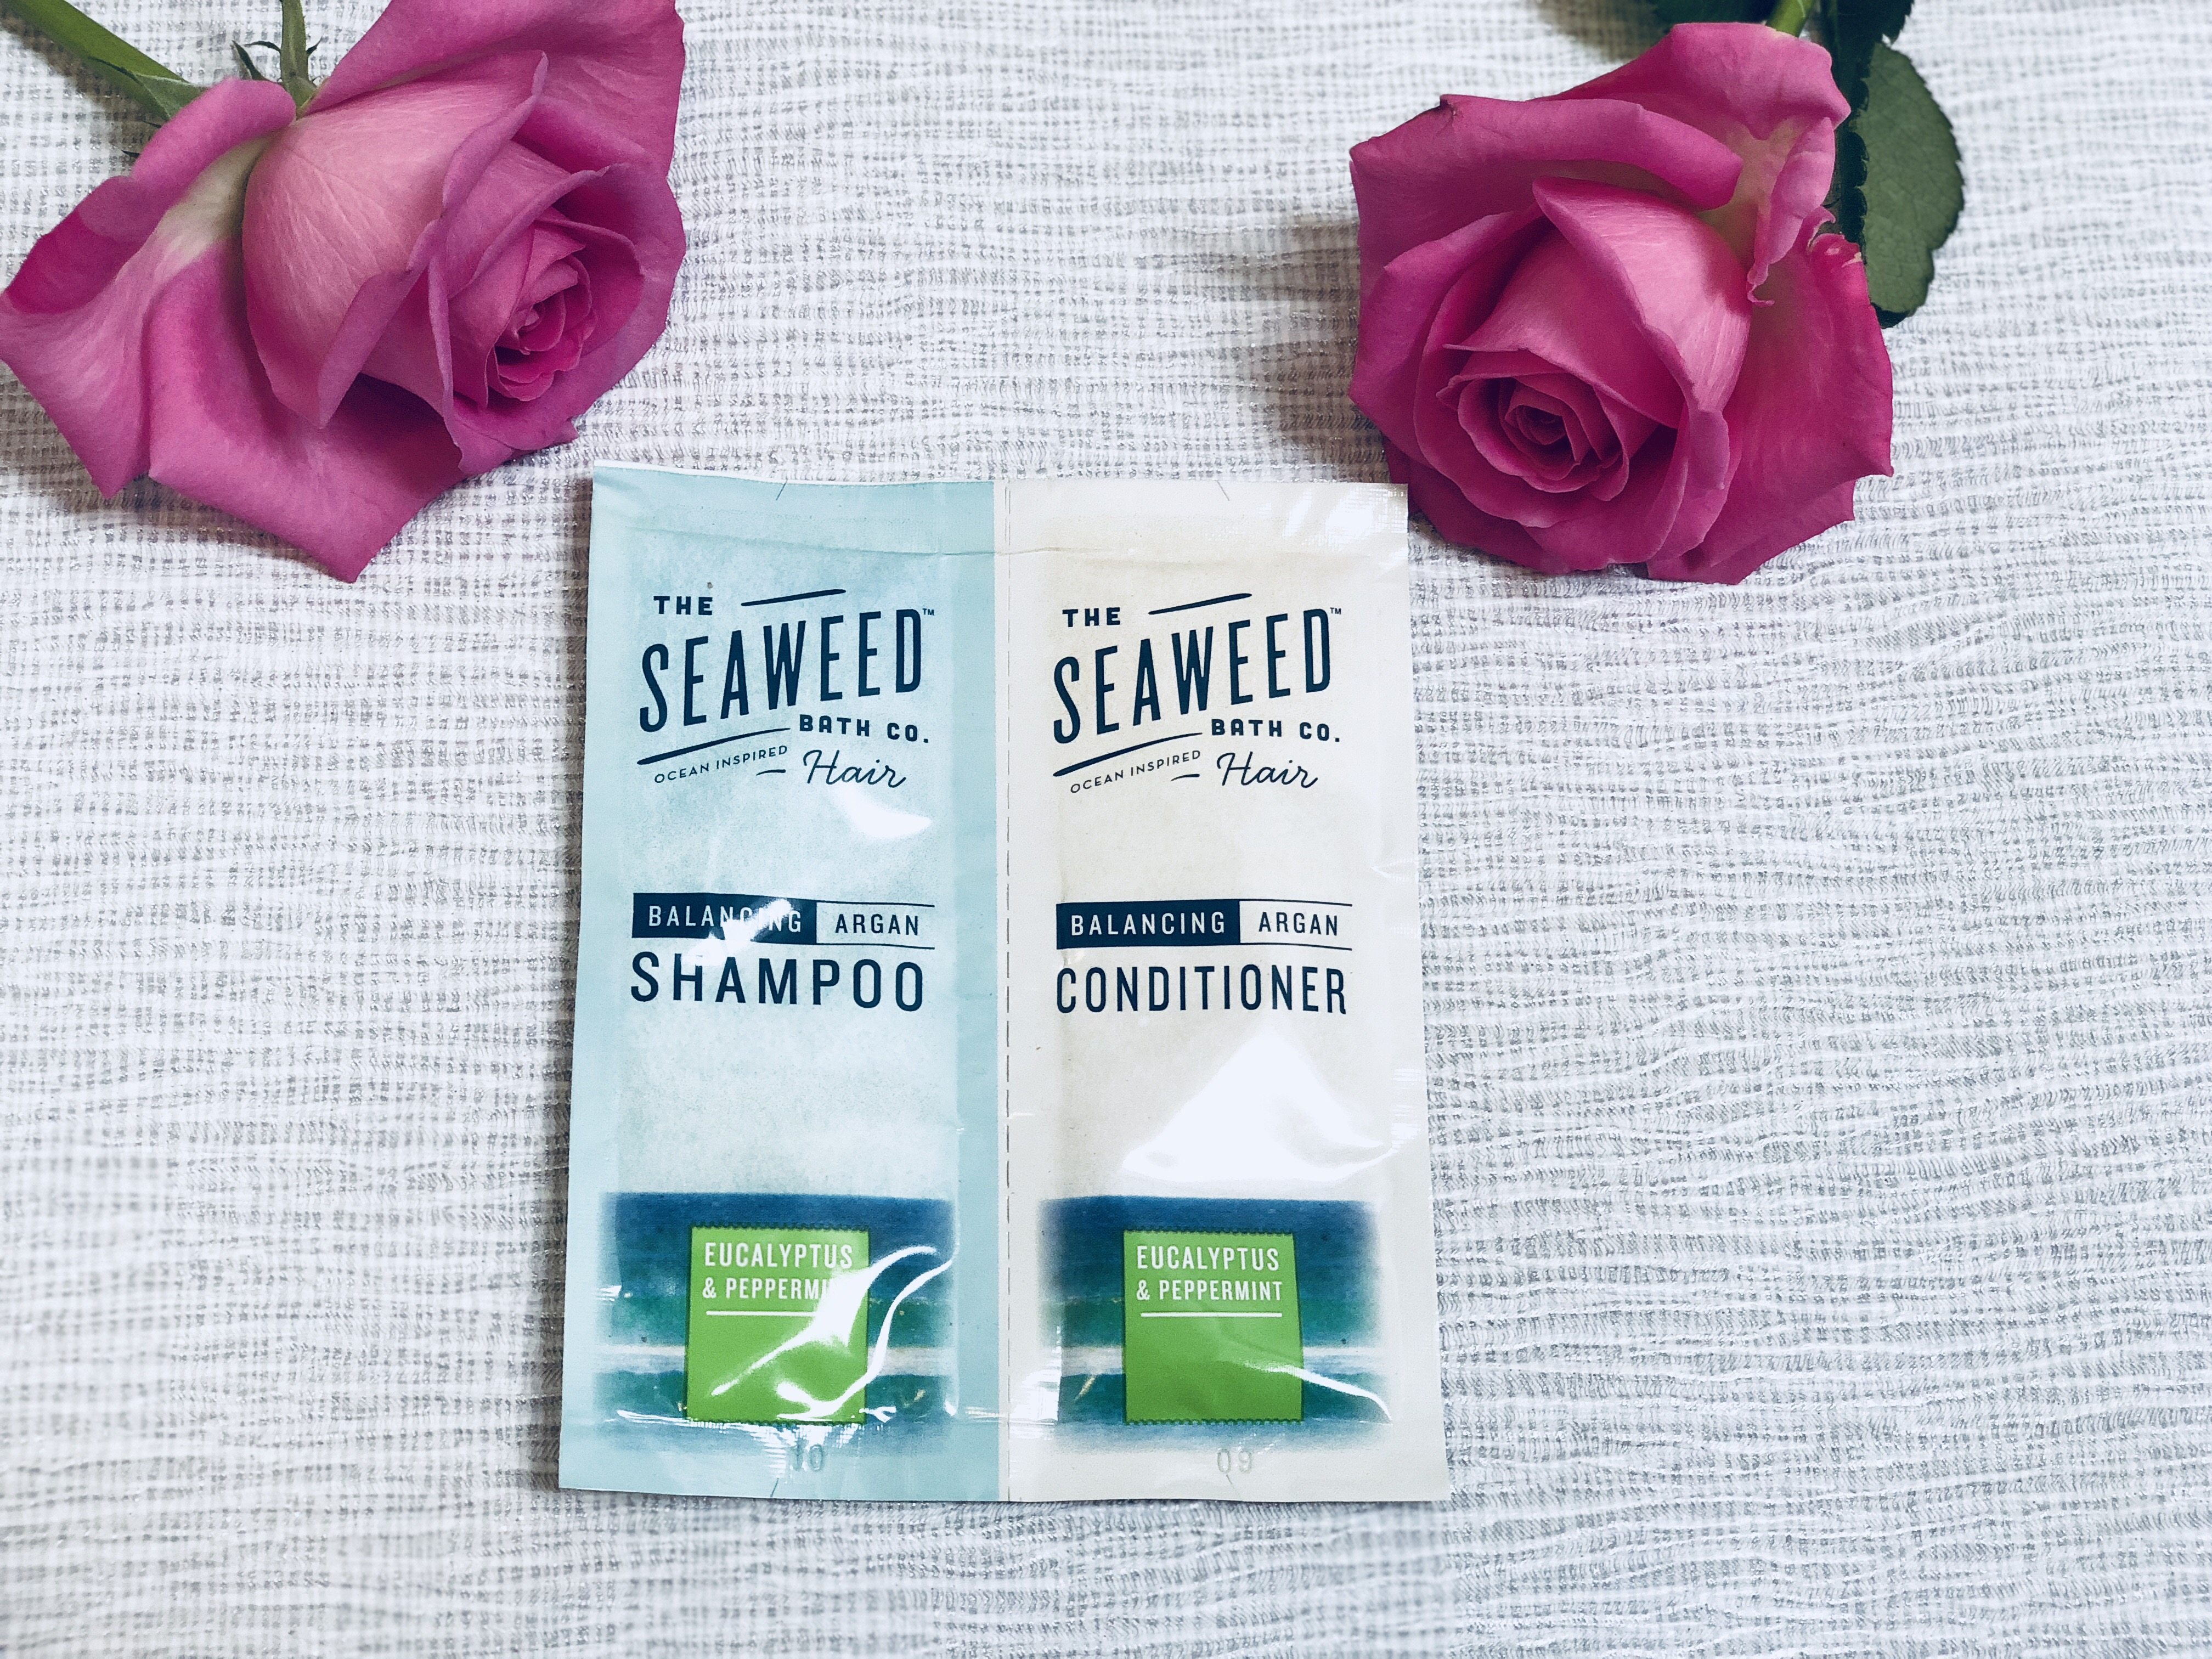 The Seaweed Bath Co. Eucalyptus & Peppermint Balancing Argan Shampoo & Conditioner